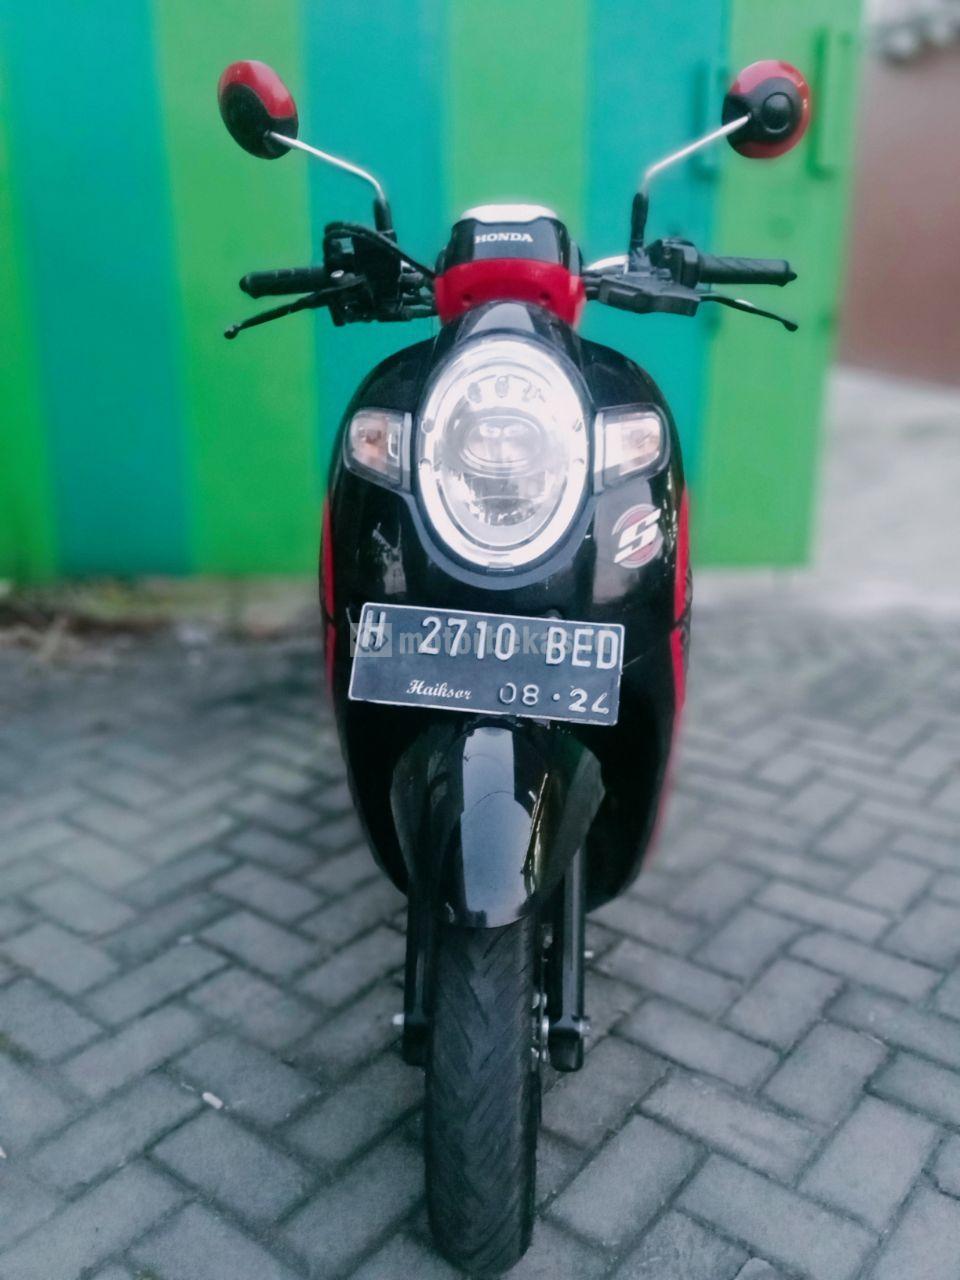 HONDA SCOOPY FI 2201 motorbekas.id